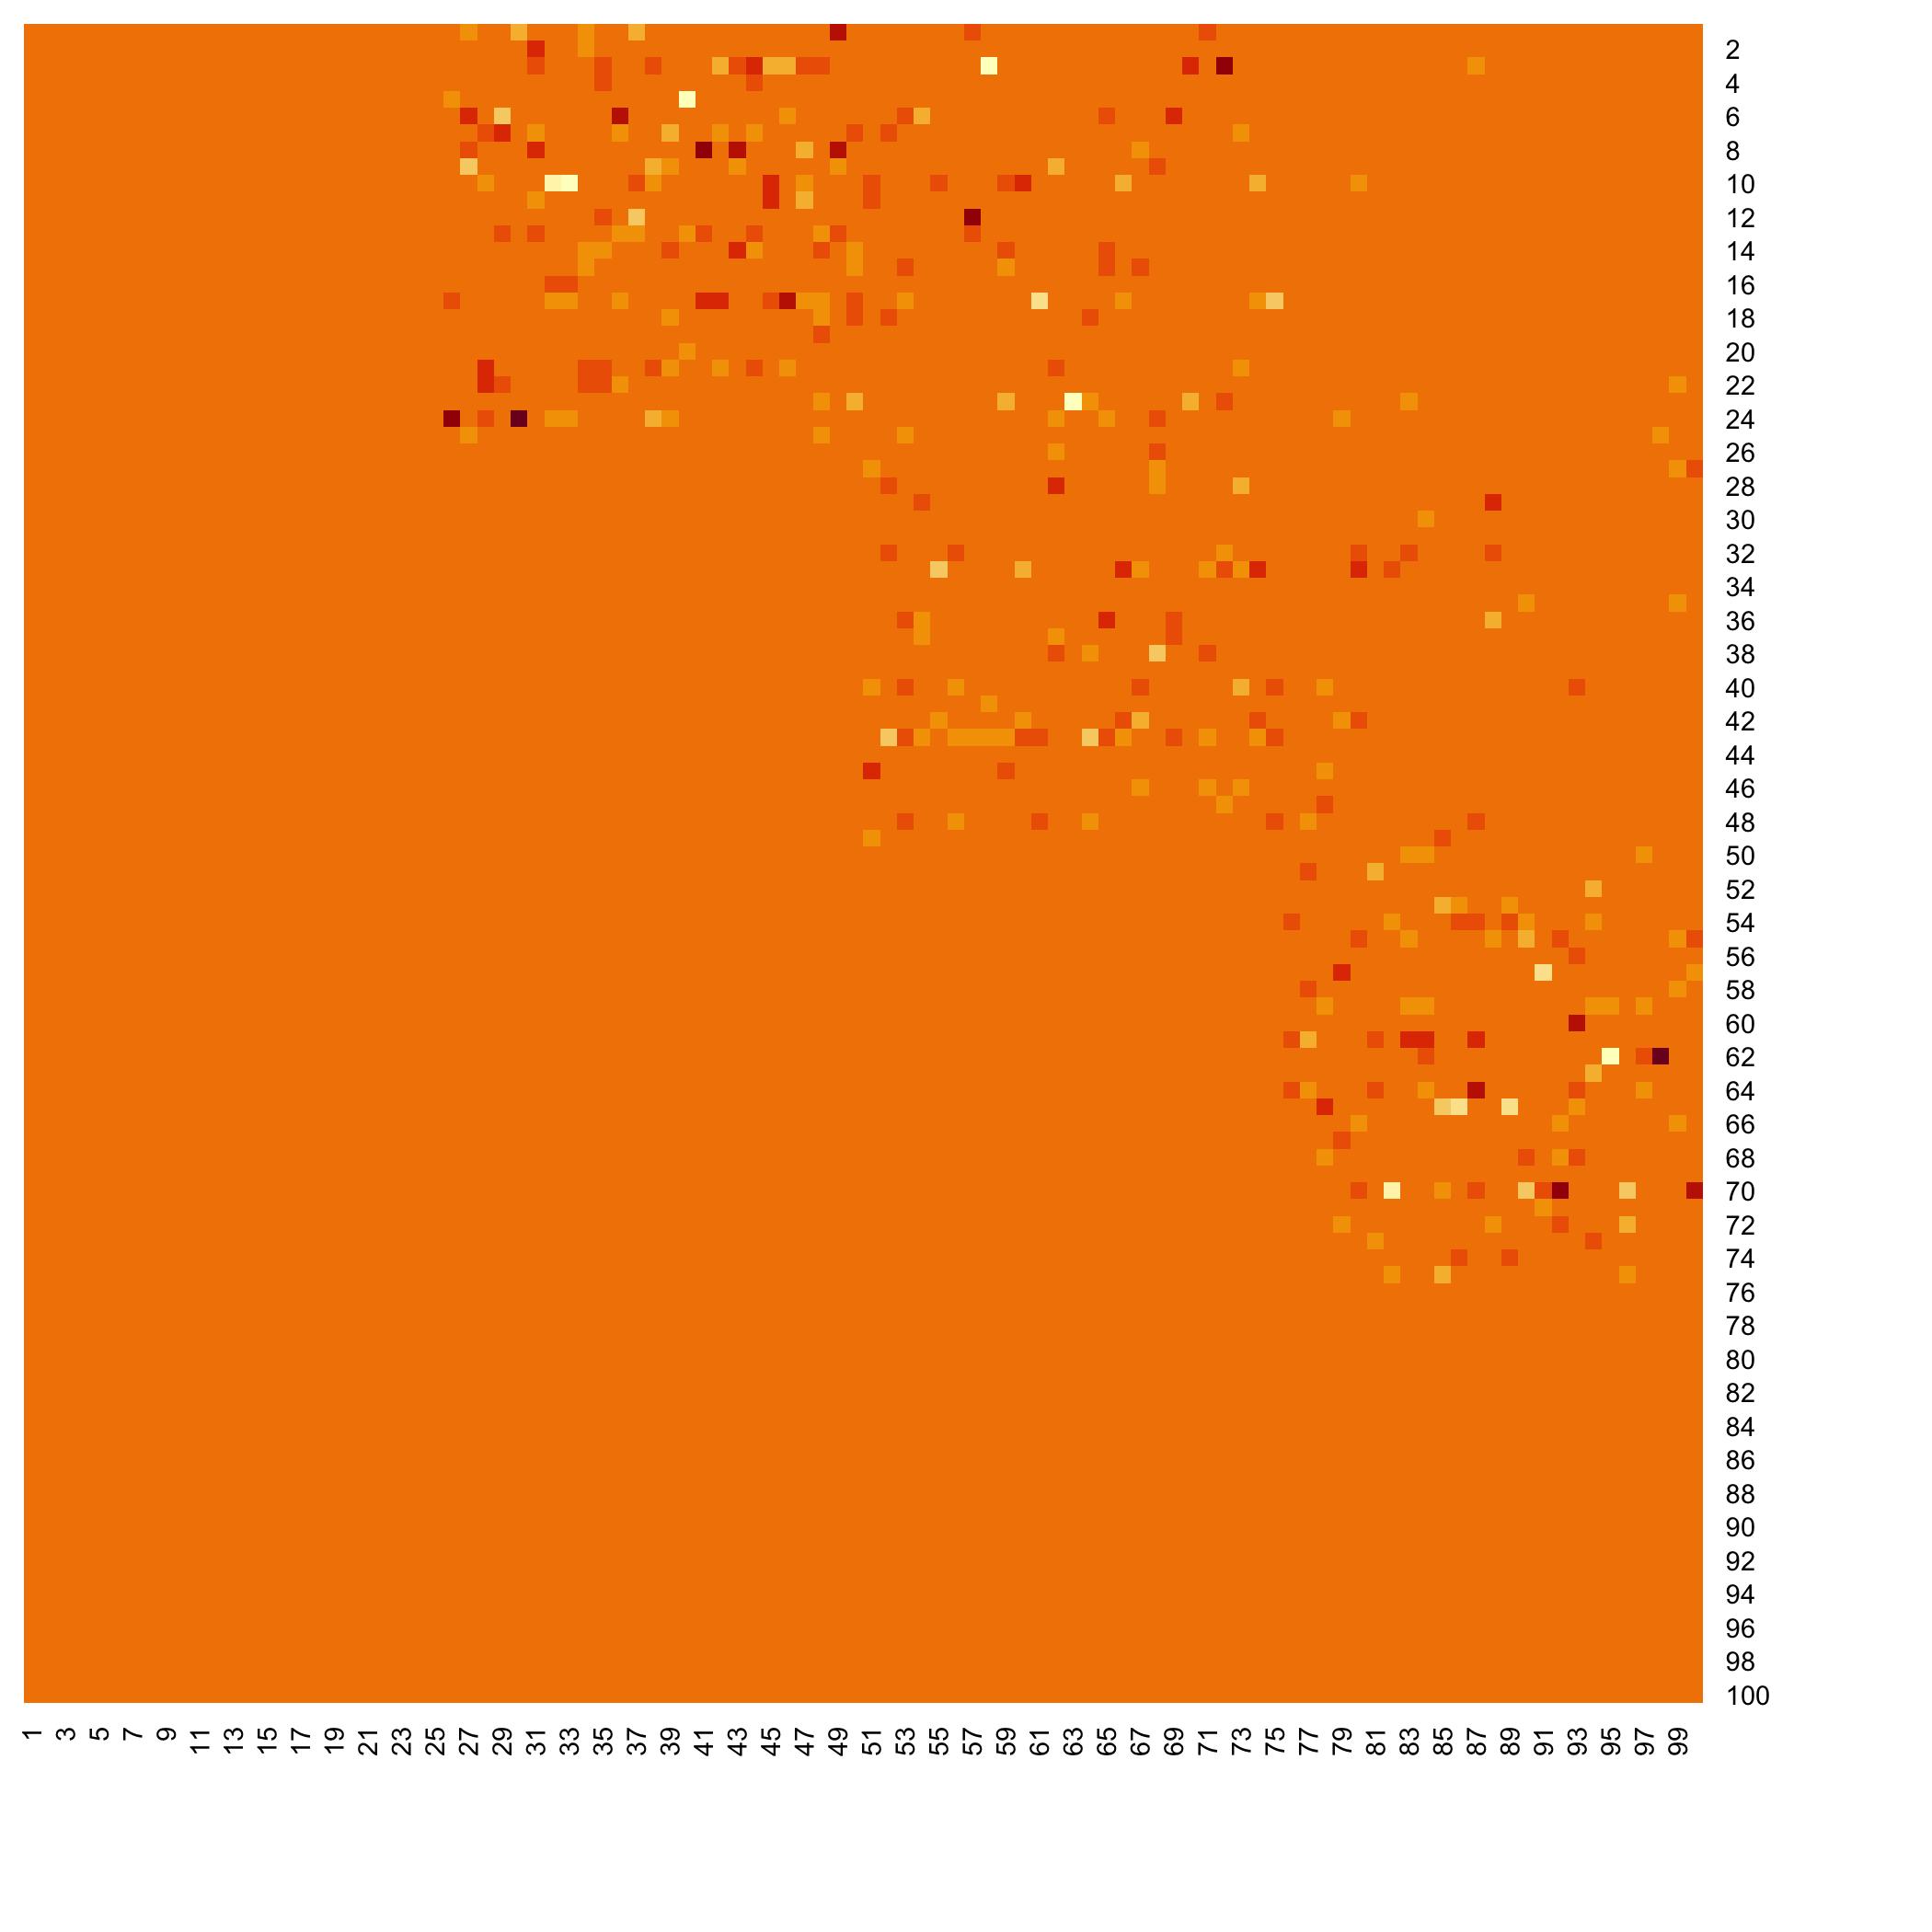 Infered coefficient matrix of the network (cascade shape).